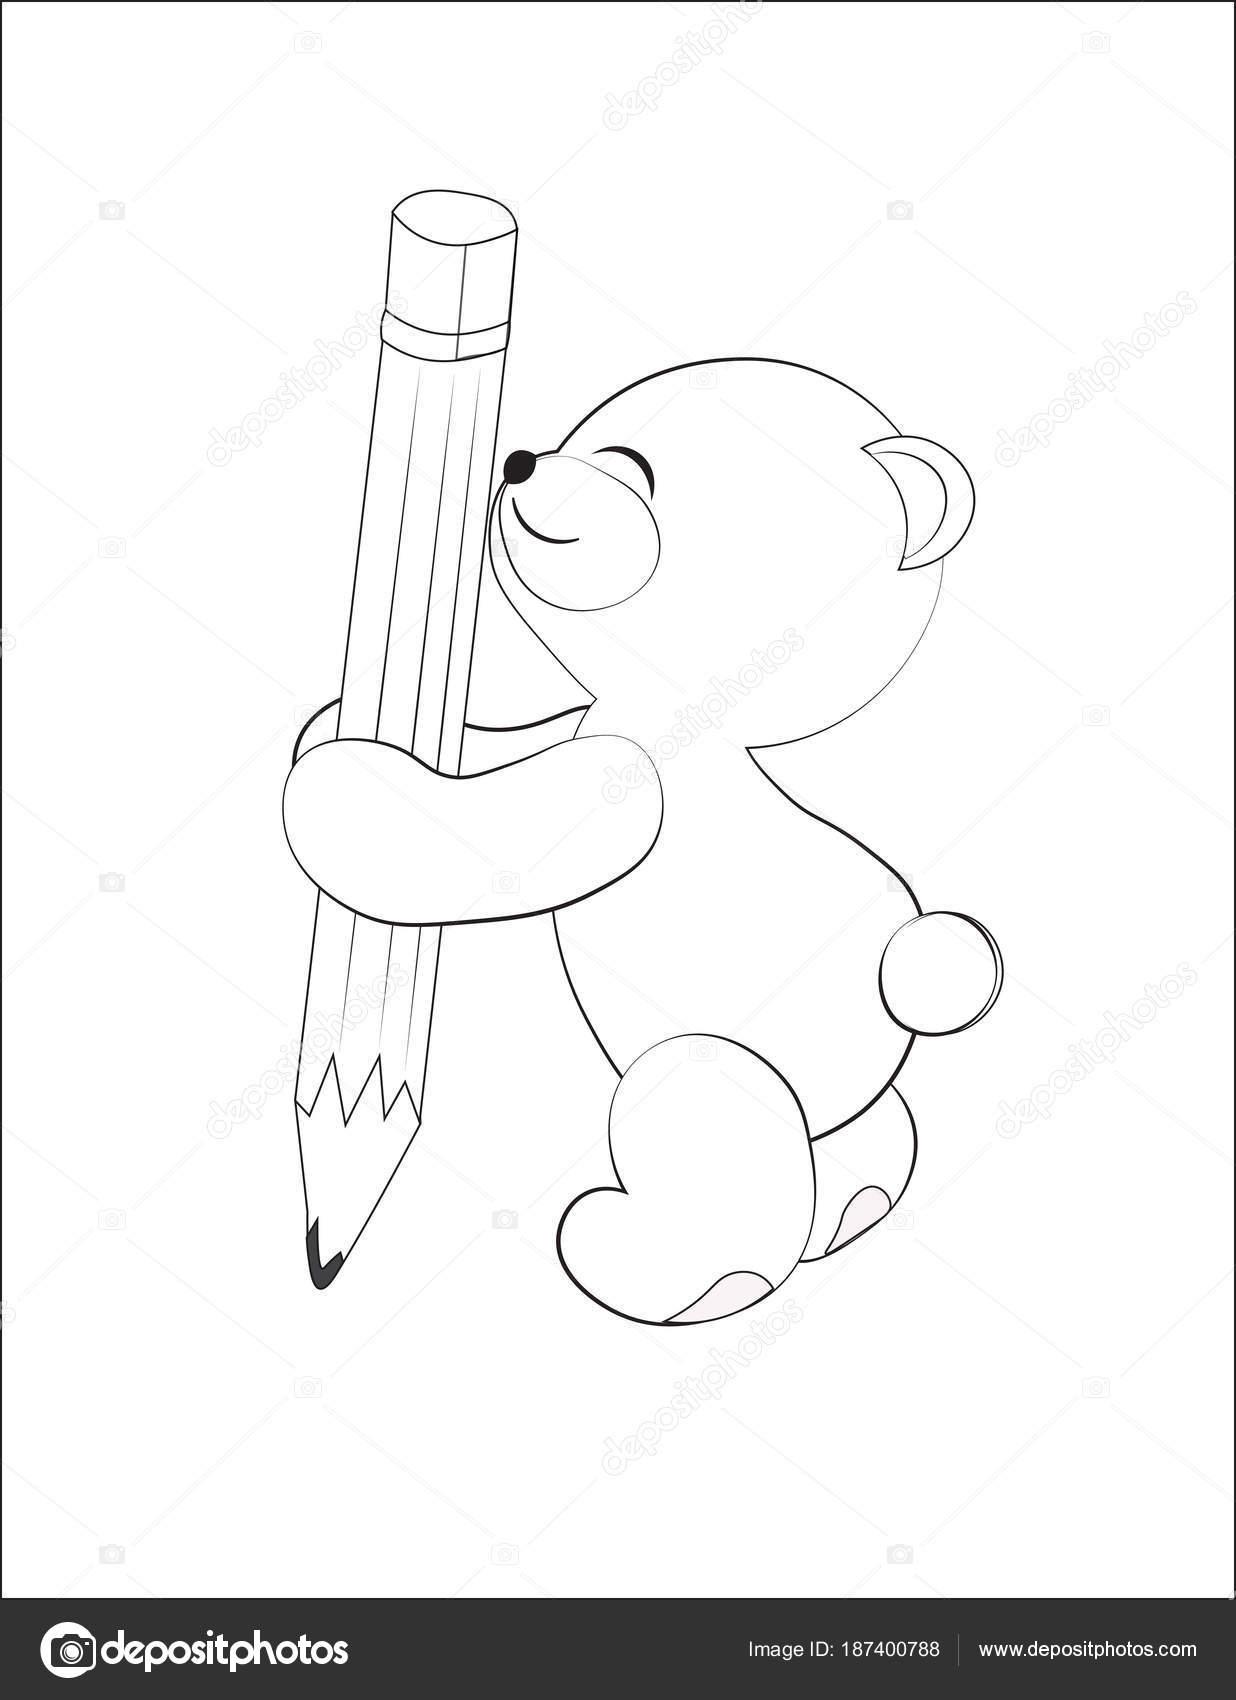 Teddybär mit einem Bleistift-Färbung — Stockvektor © Lollitta #187400788